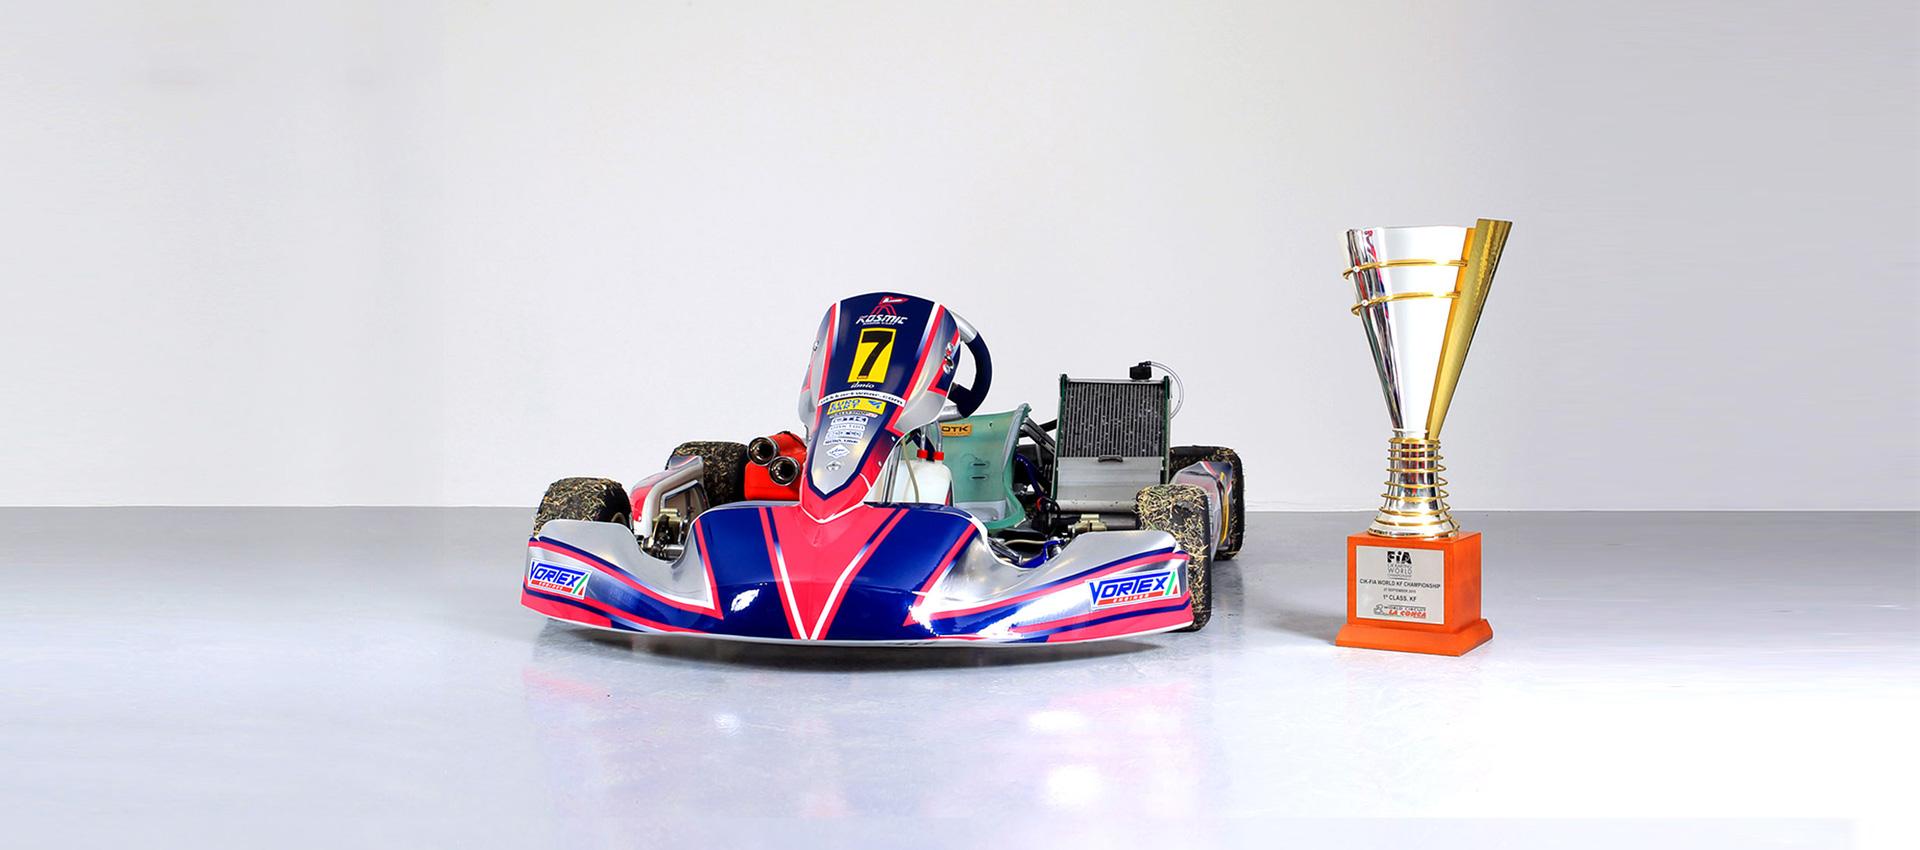 Mad Croc  A born winner - TKART - News, tips, tech about karting